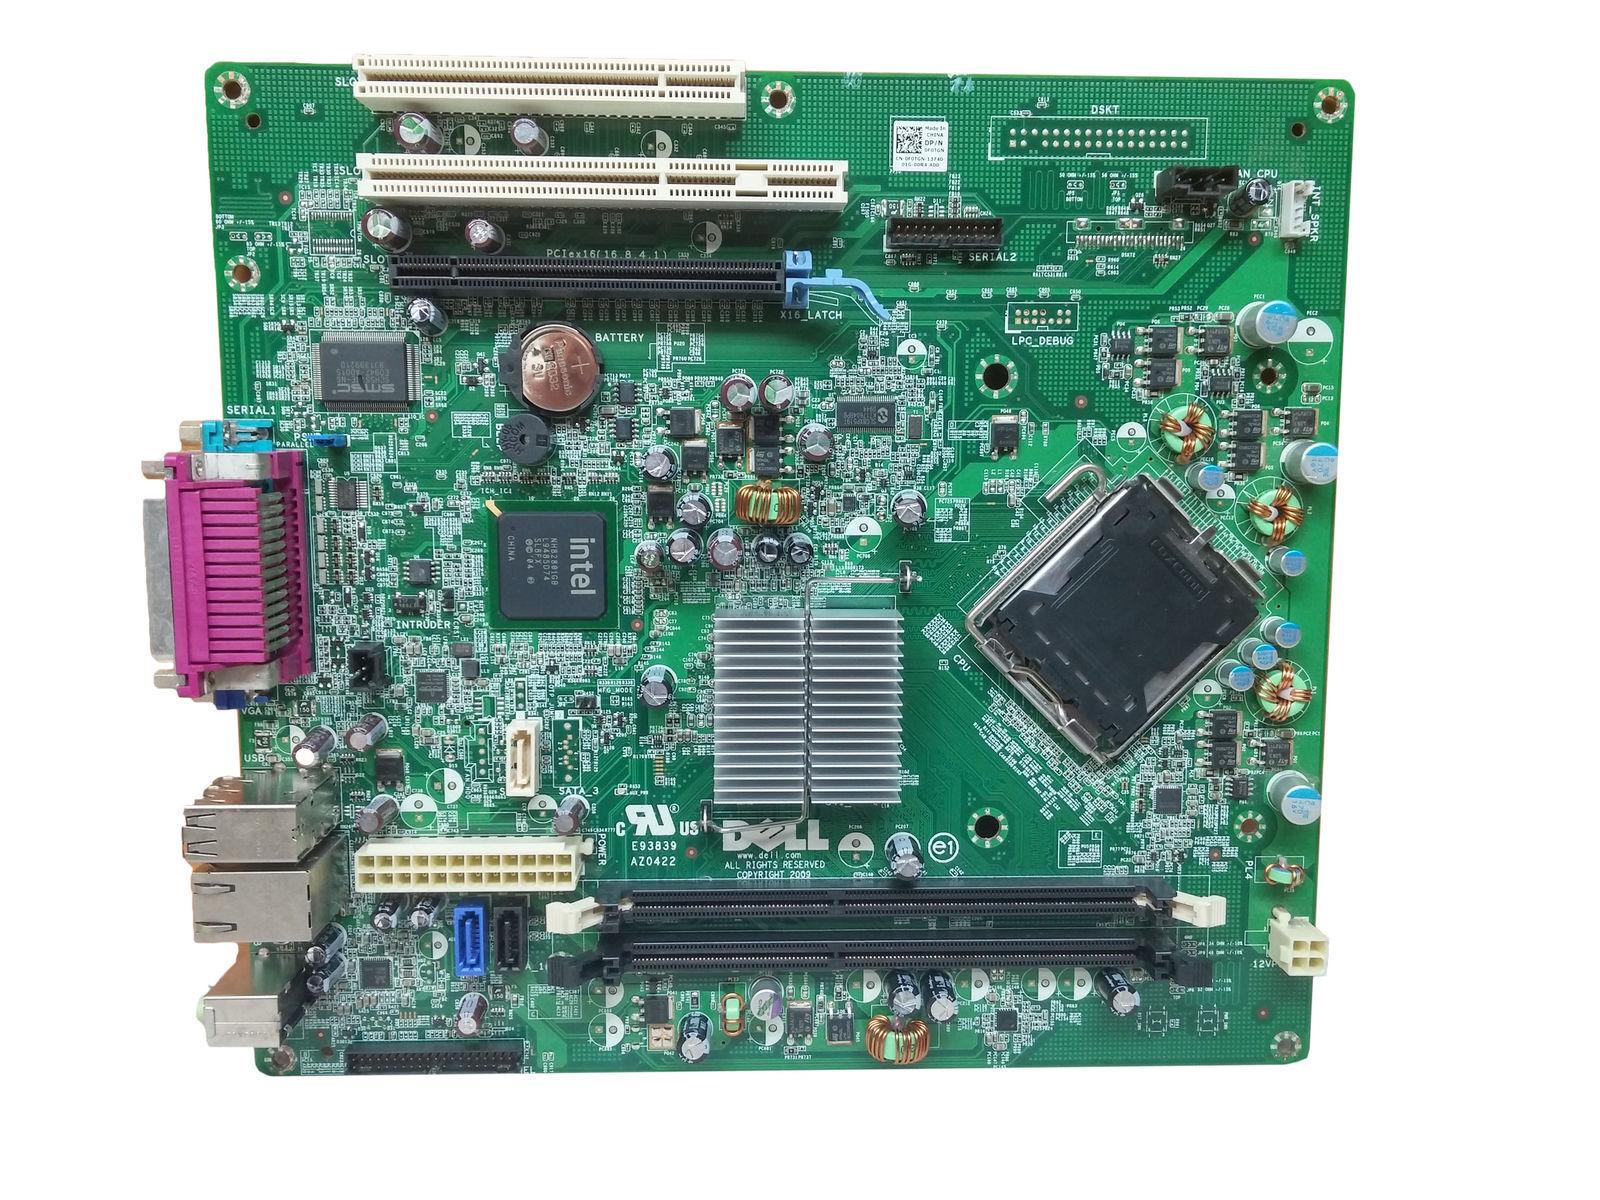 Genuine Dell Optiplex 380 DDR3 LGA 775 Desktop Motherboard 0HN7XN HN7XN F0TGN